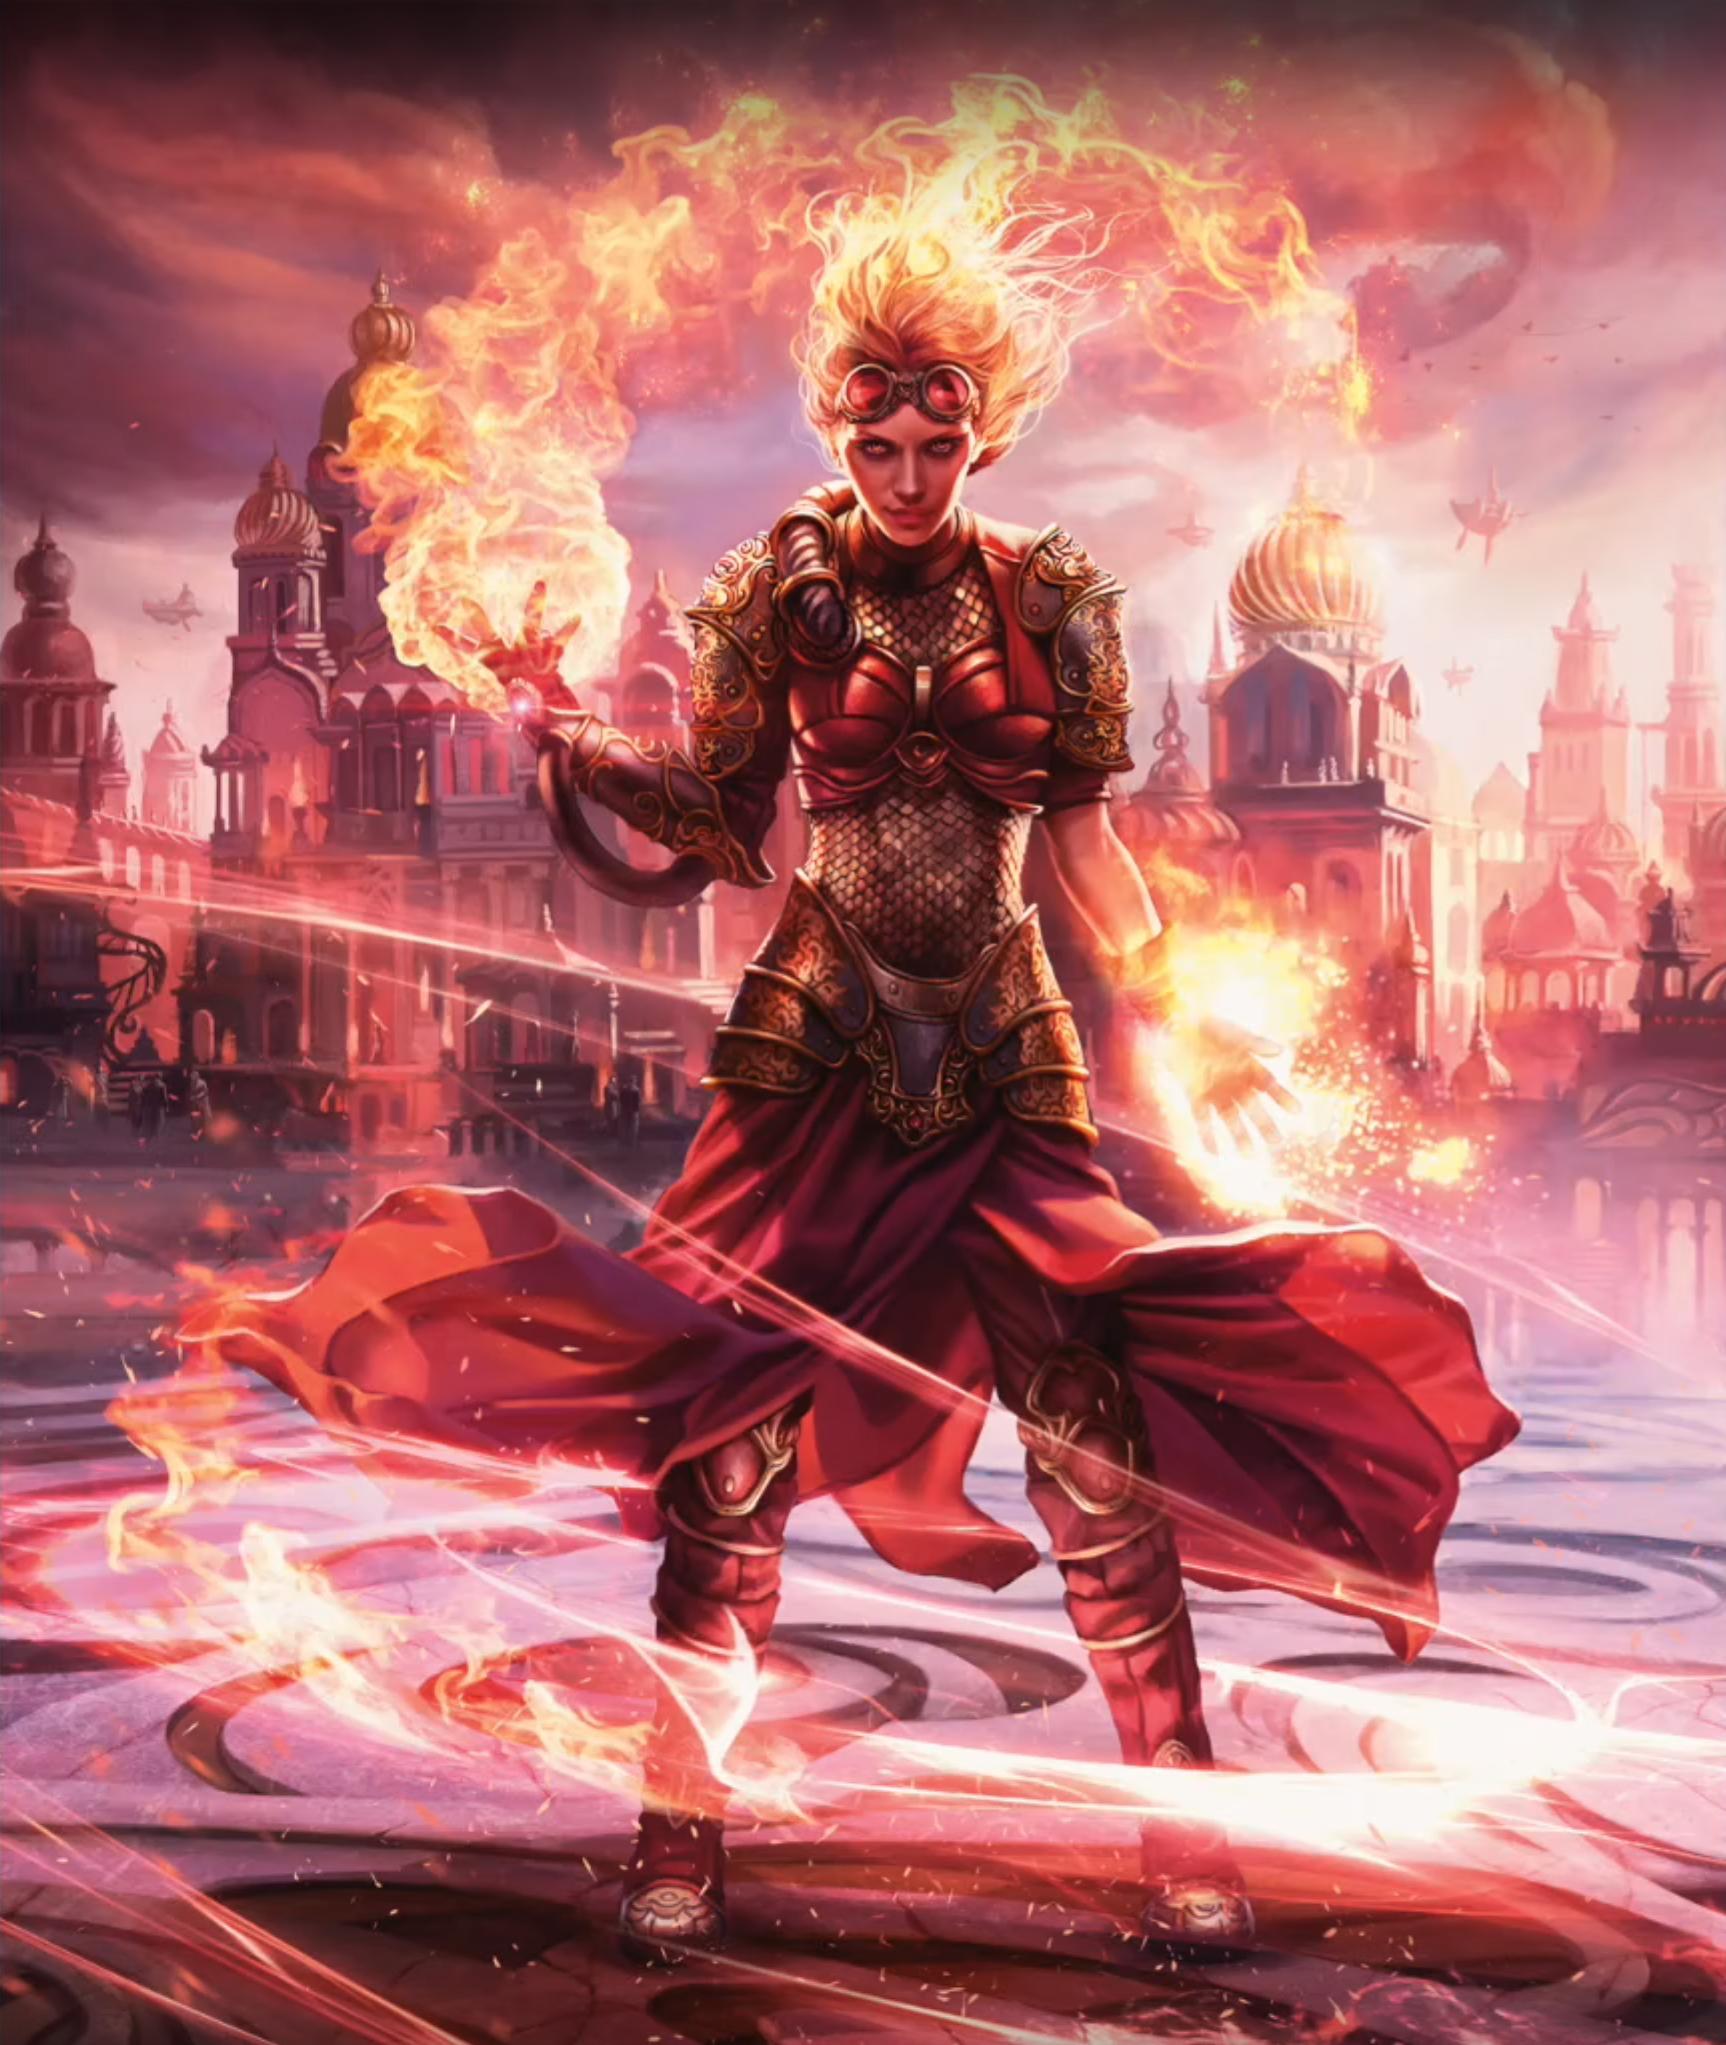 Resultado de imagen de chandra torch of defiance art